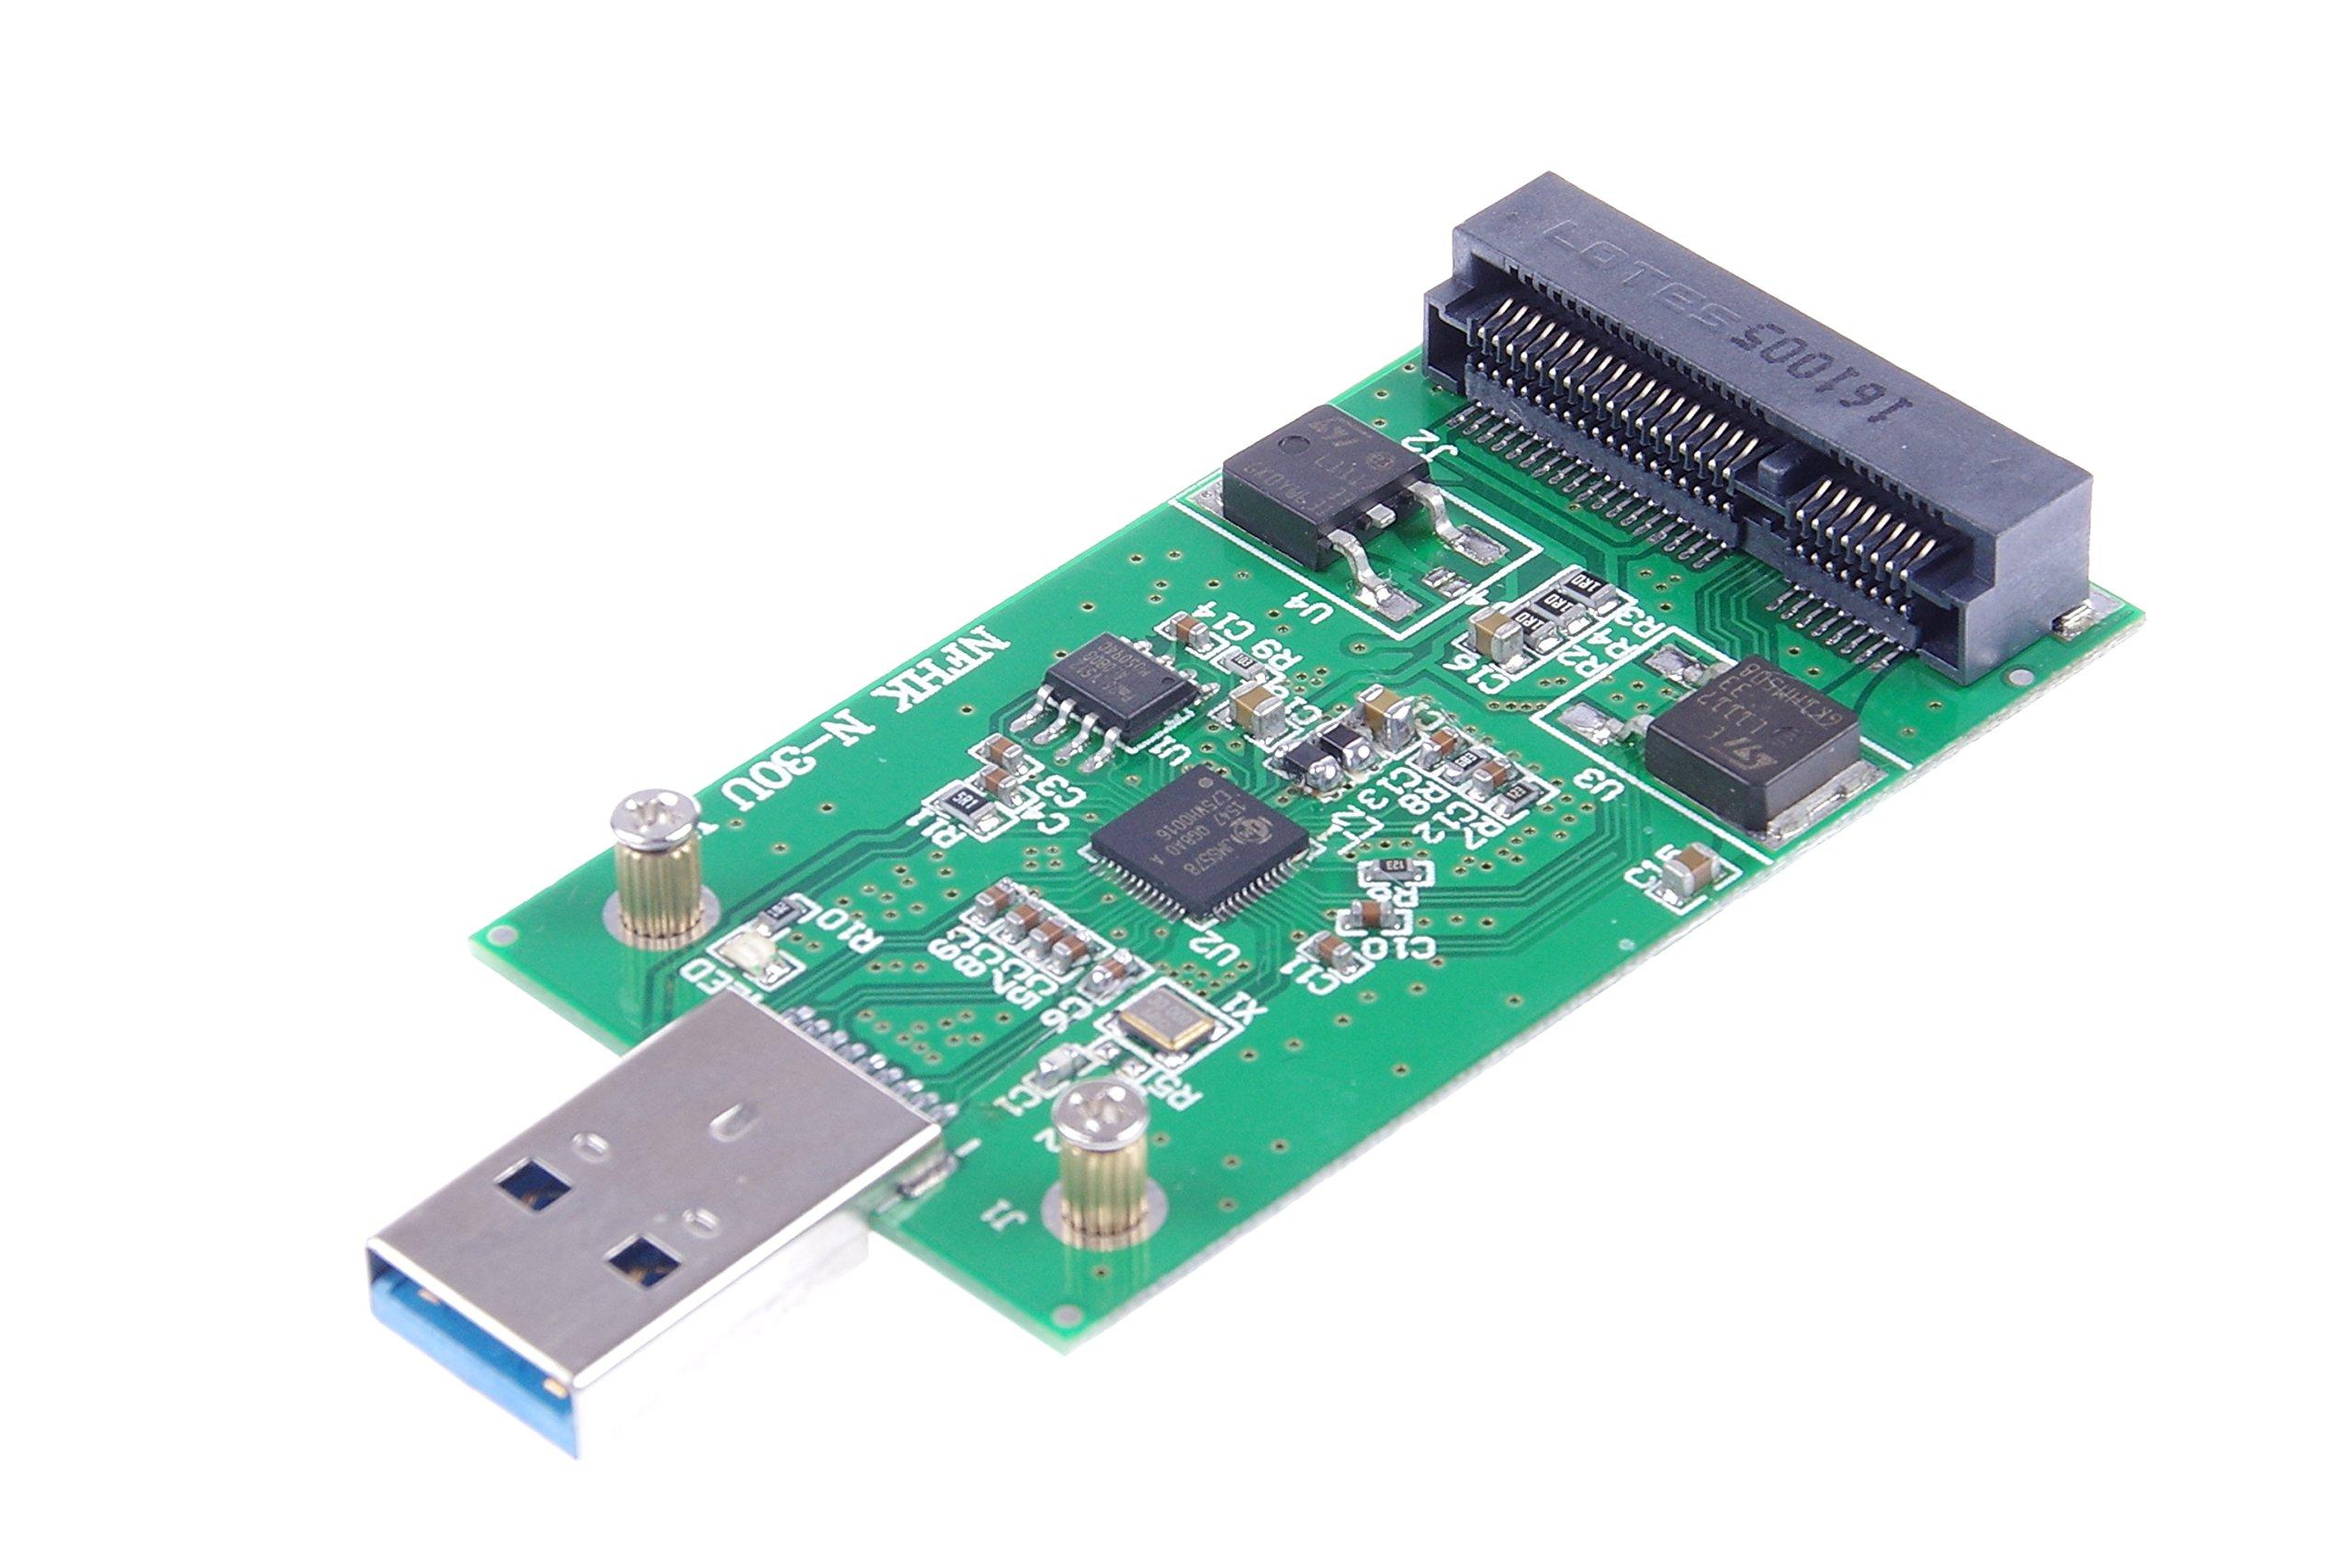 KNACRO USB 3.0 mSATA SSD Adapter as USB Disk Driver don't need USB cable USB 3.0 to mSATA SSD adapter card by KNACRO (Image #2)